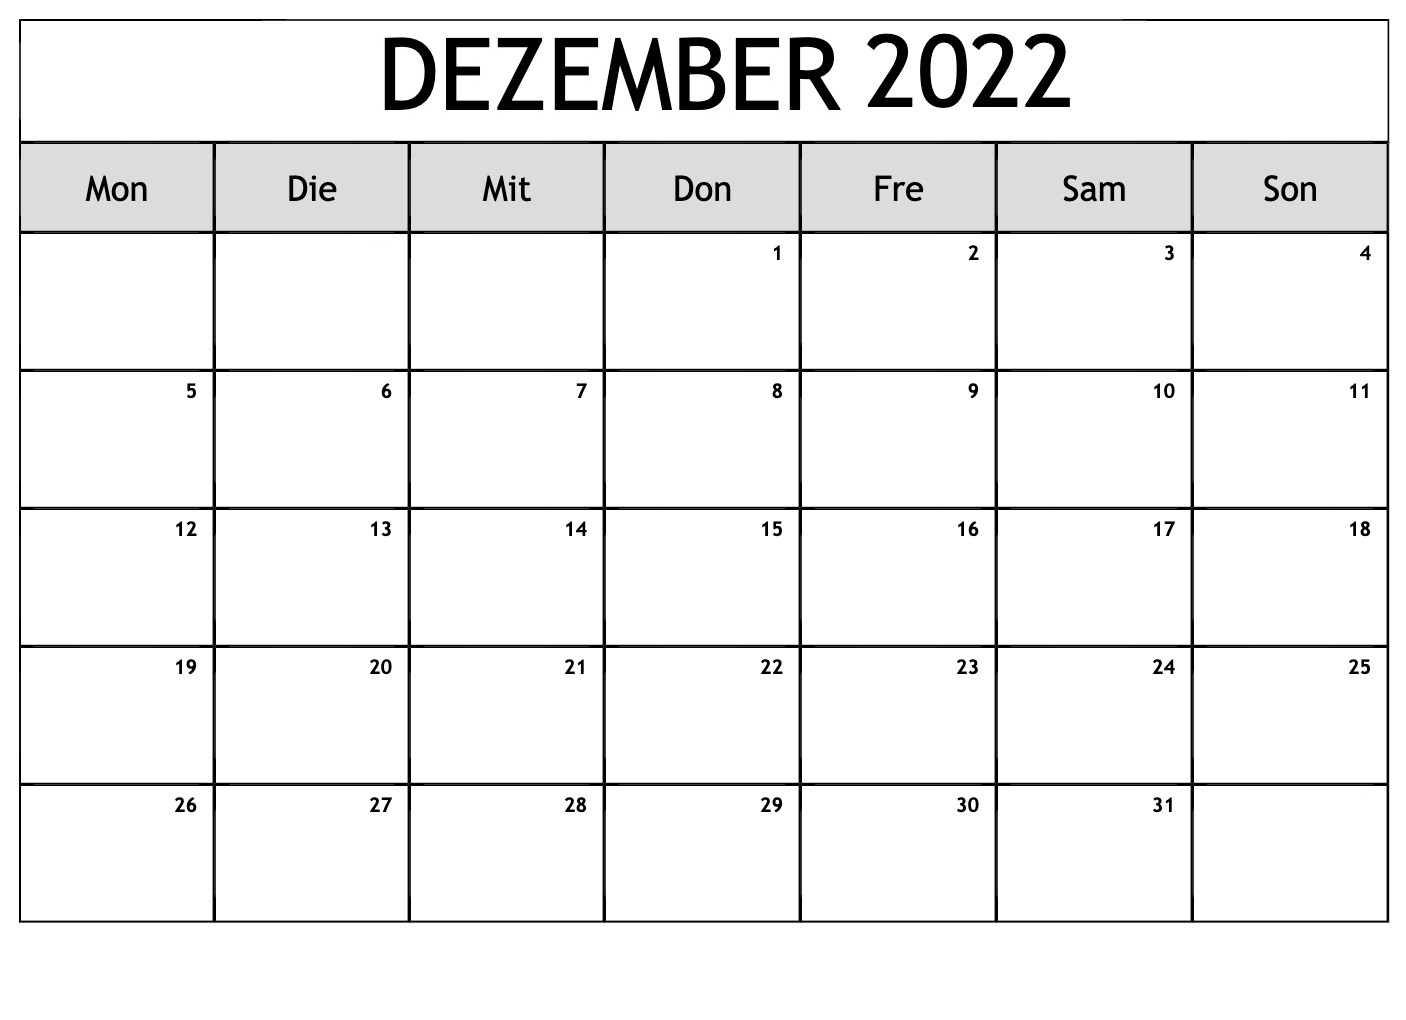 Dezember Kalender 2022